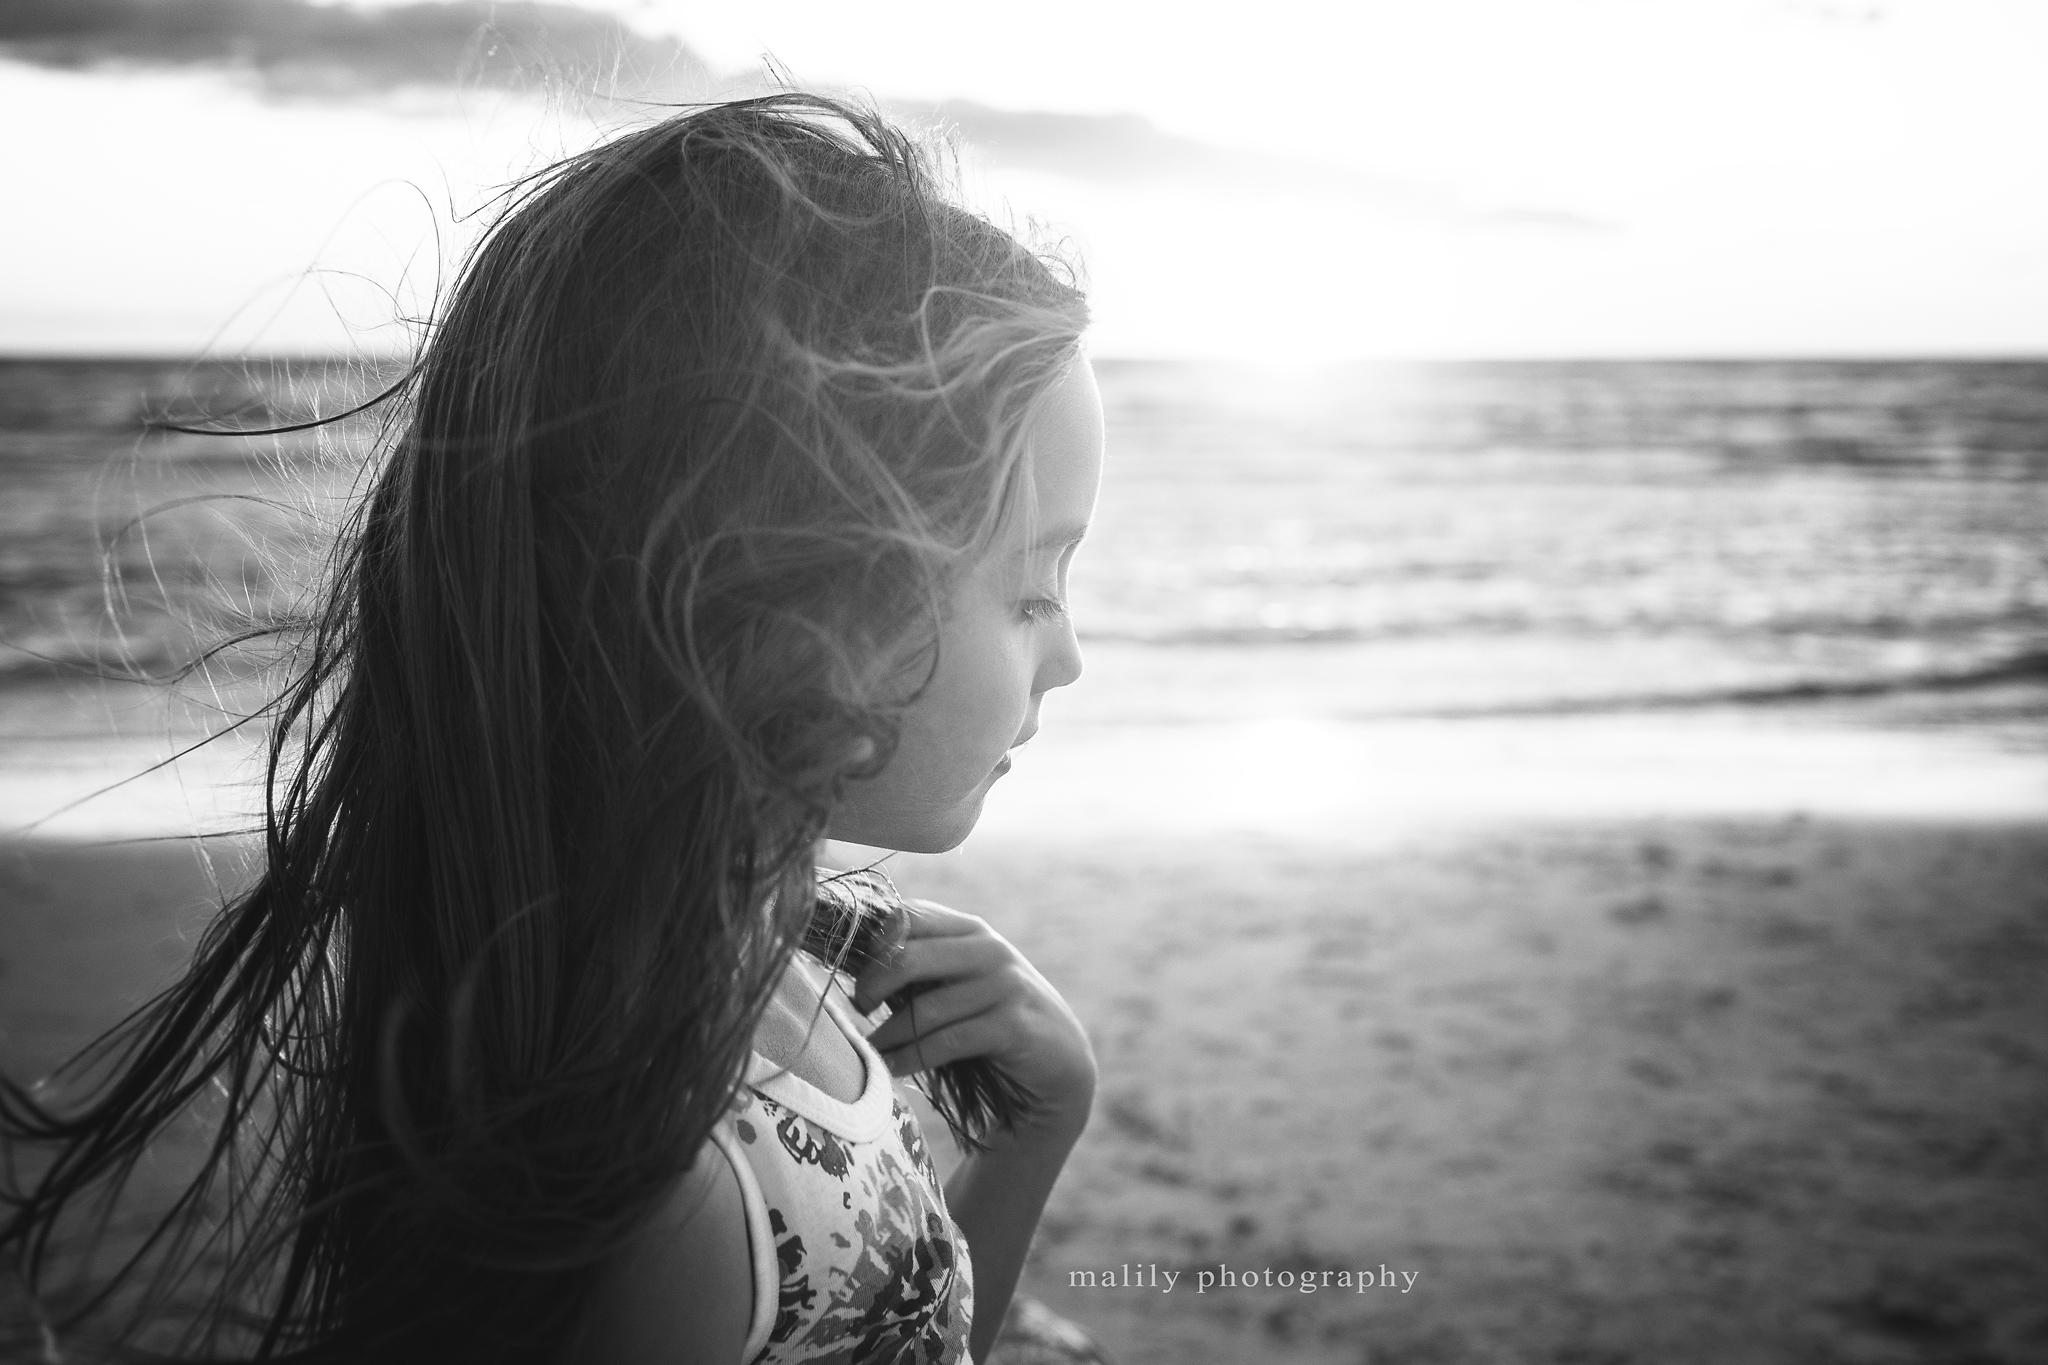 malily photography | pottsville, pa photographer